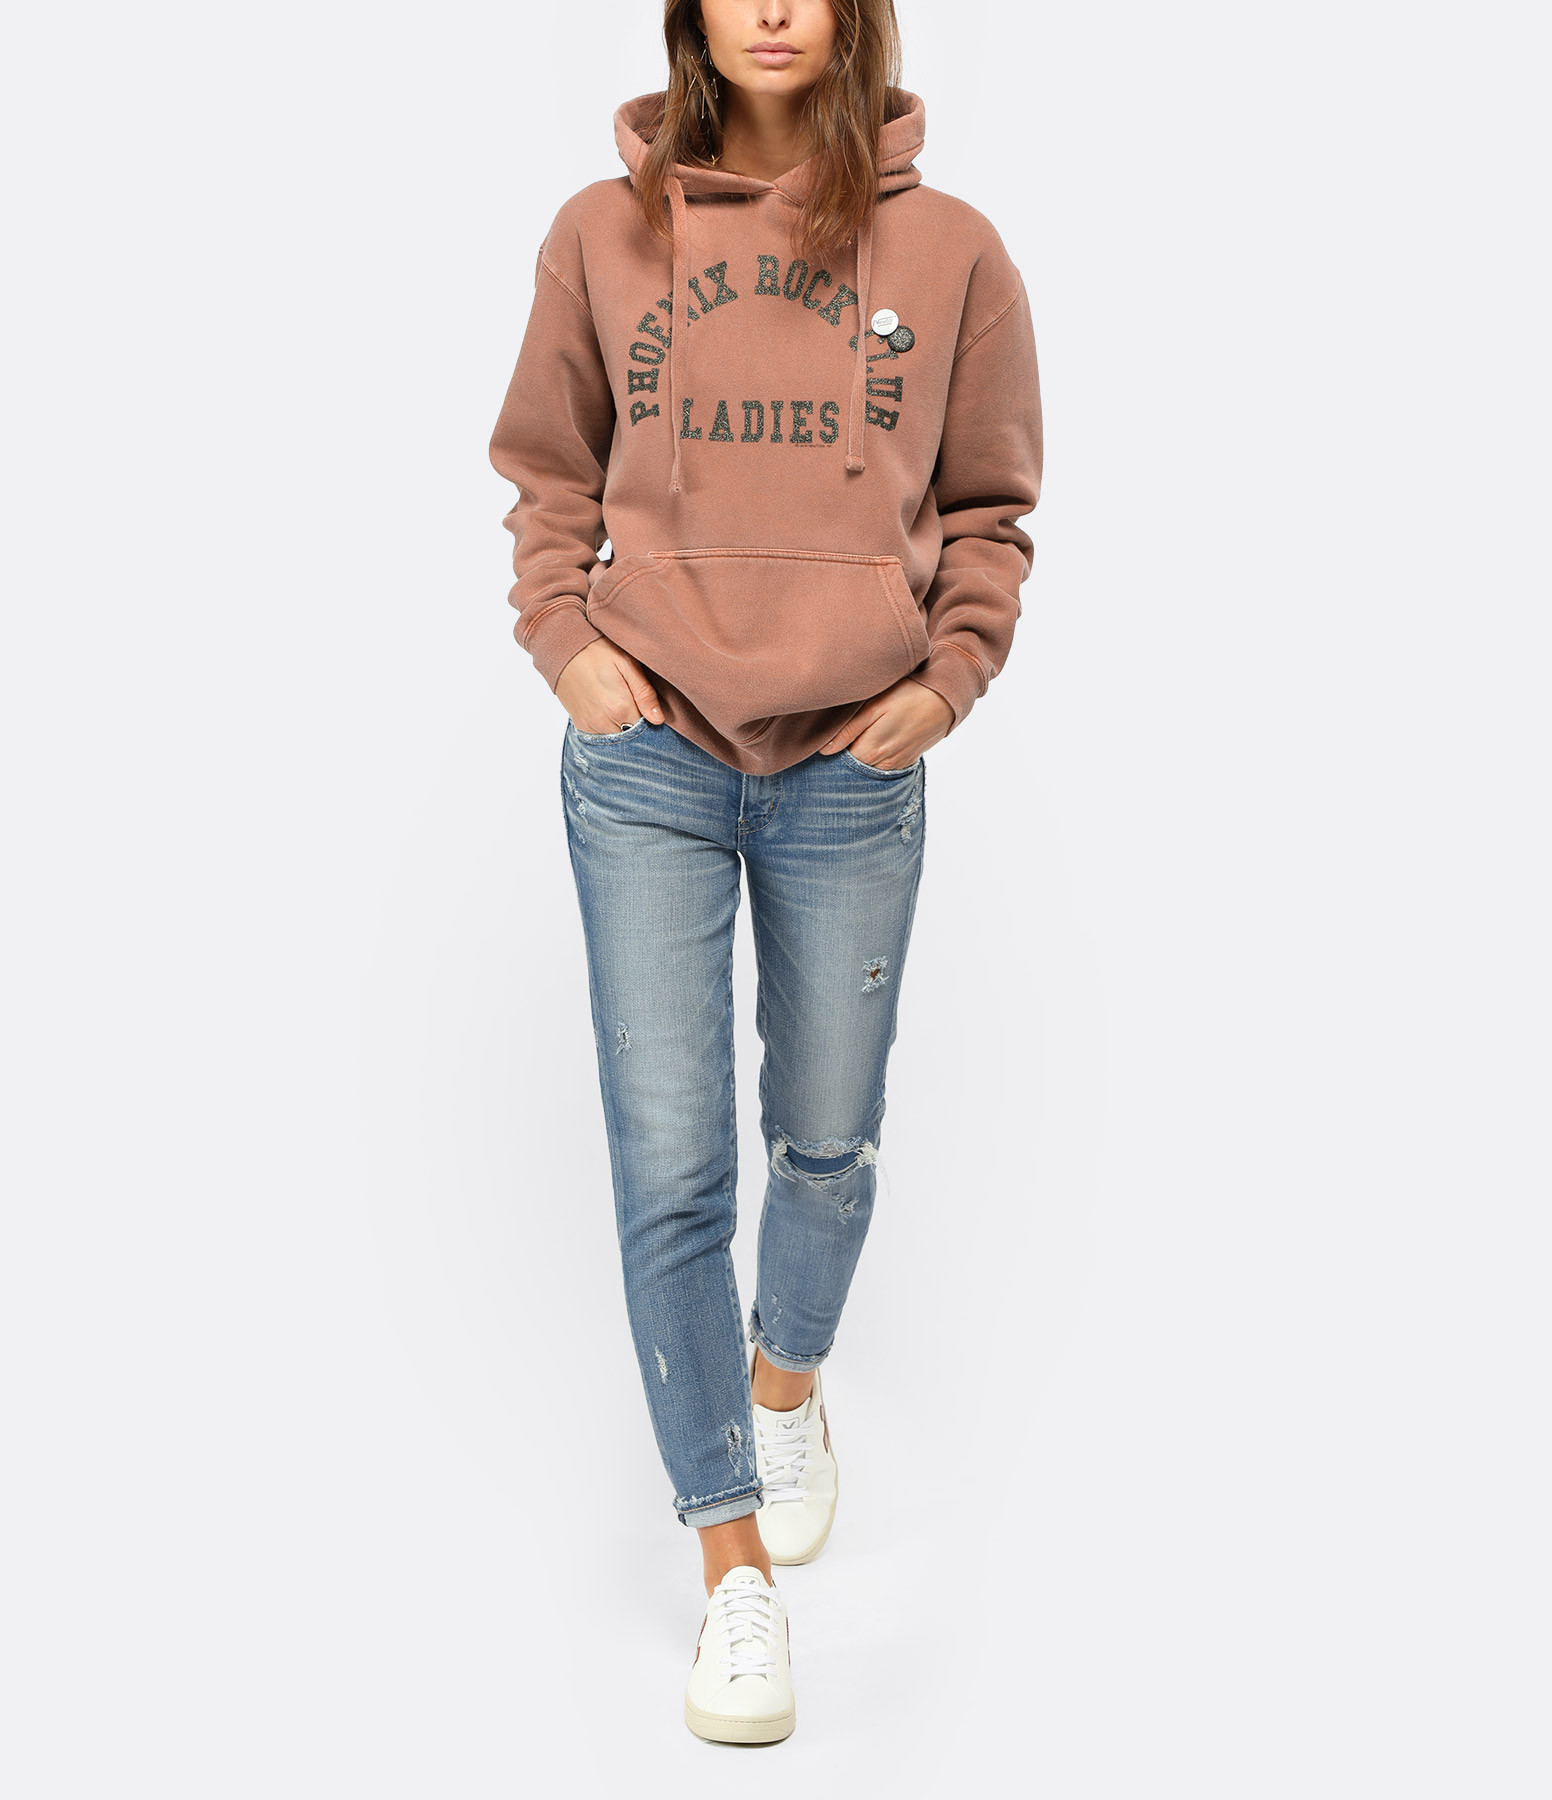 NEWTONE - Sweatshirt Phoenix Coton Yam